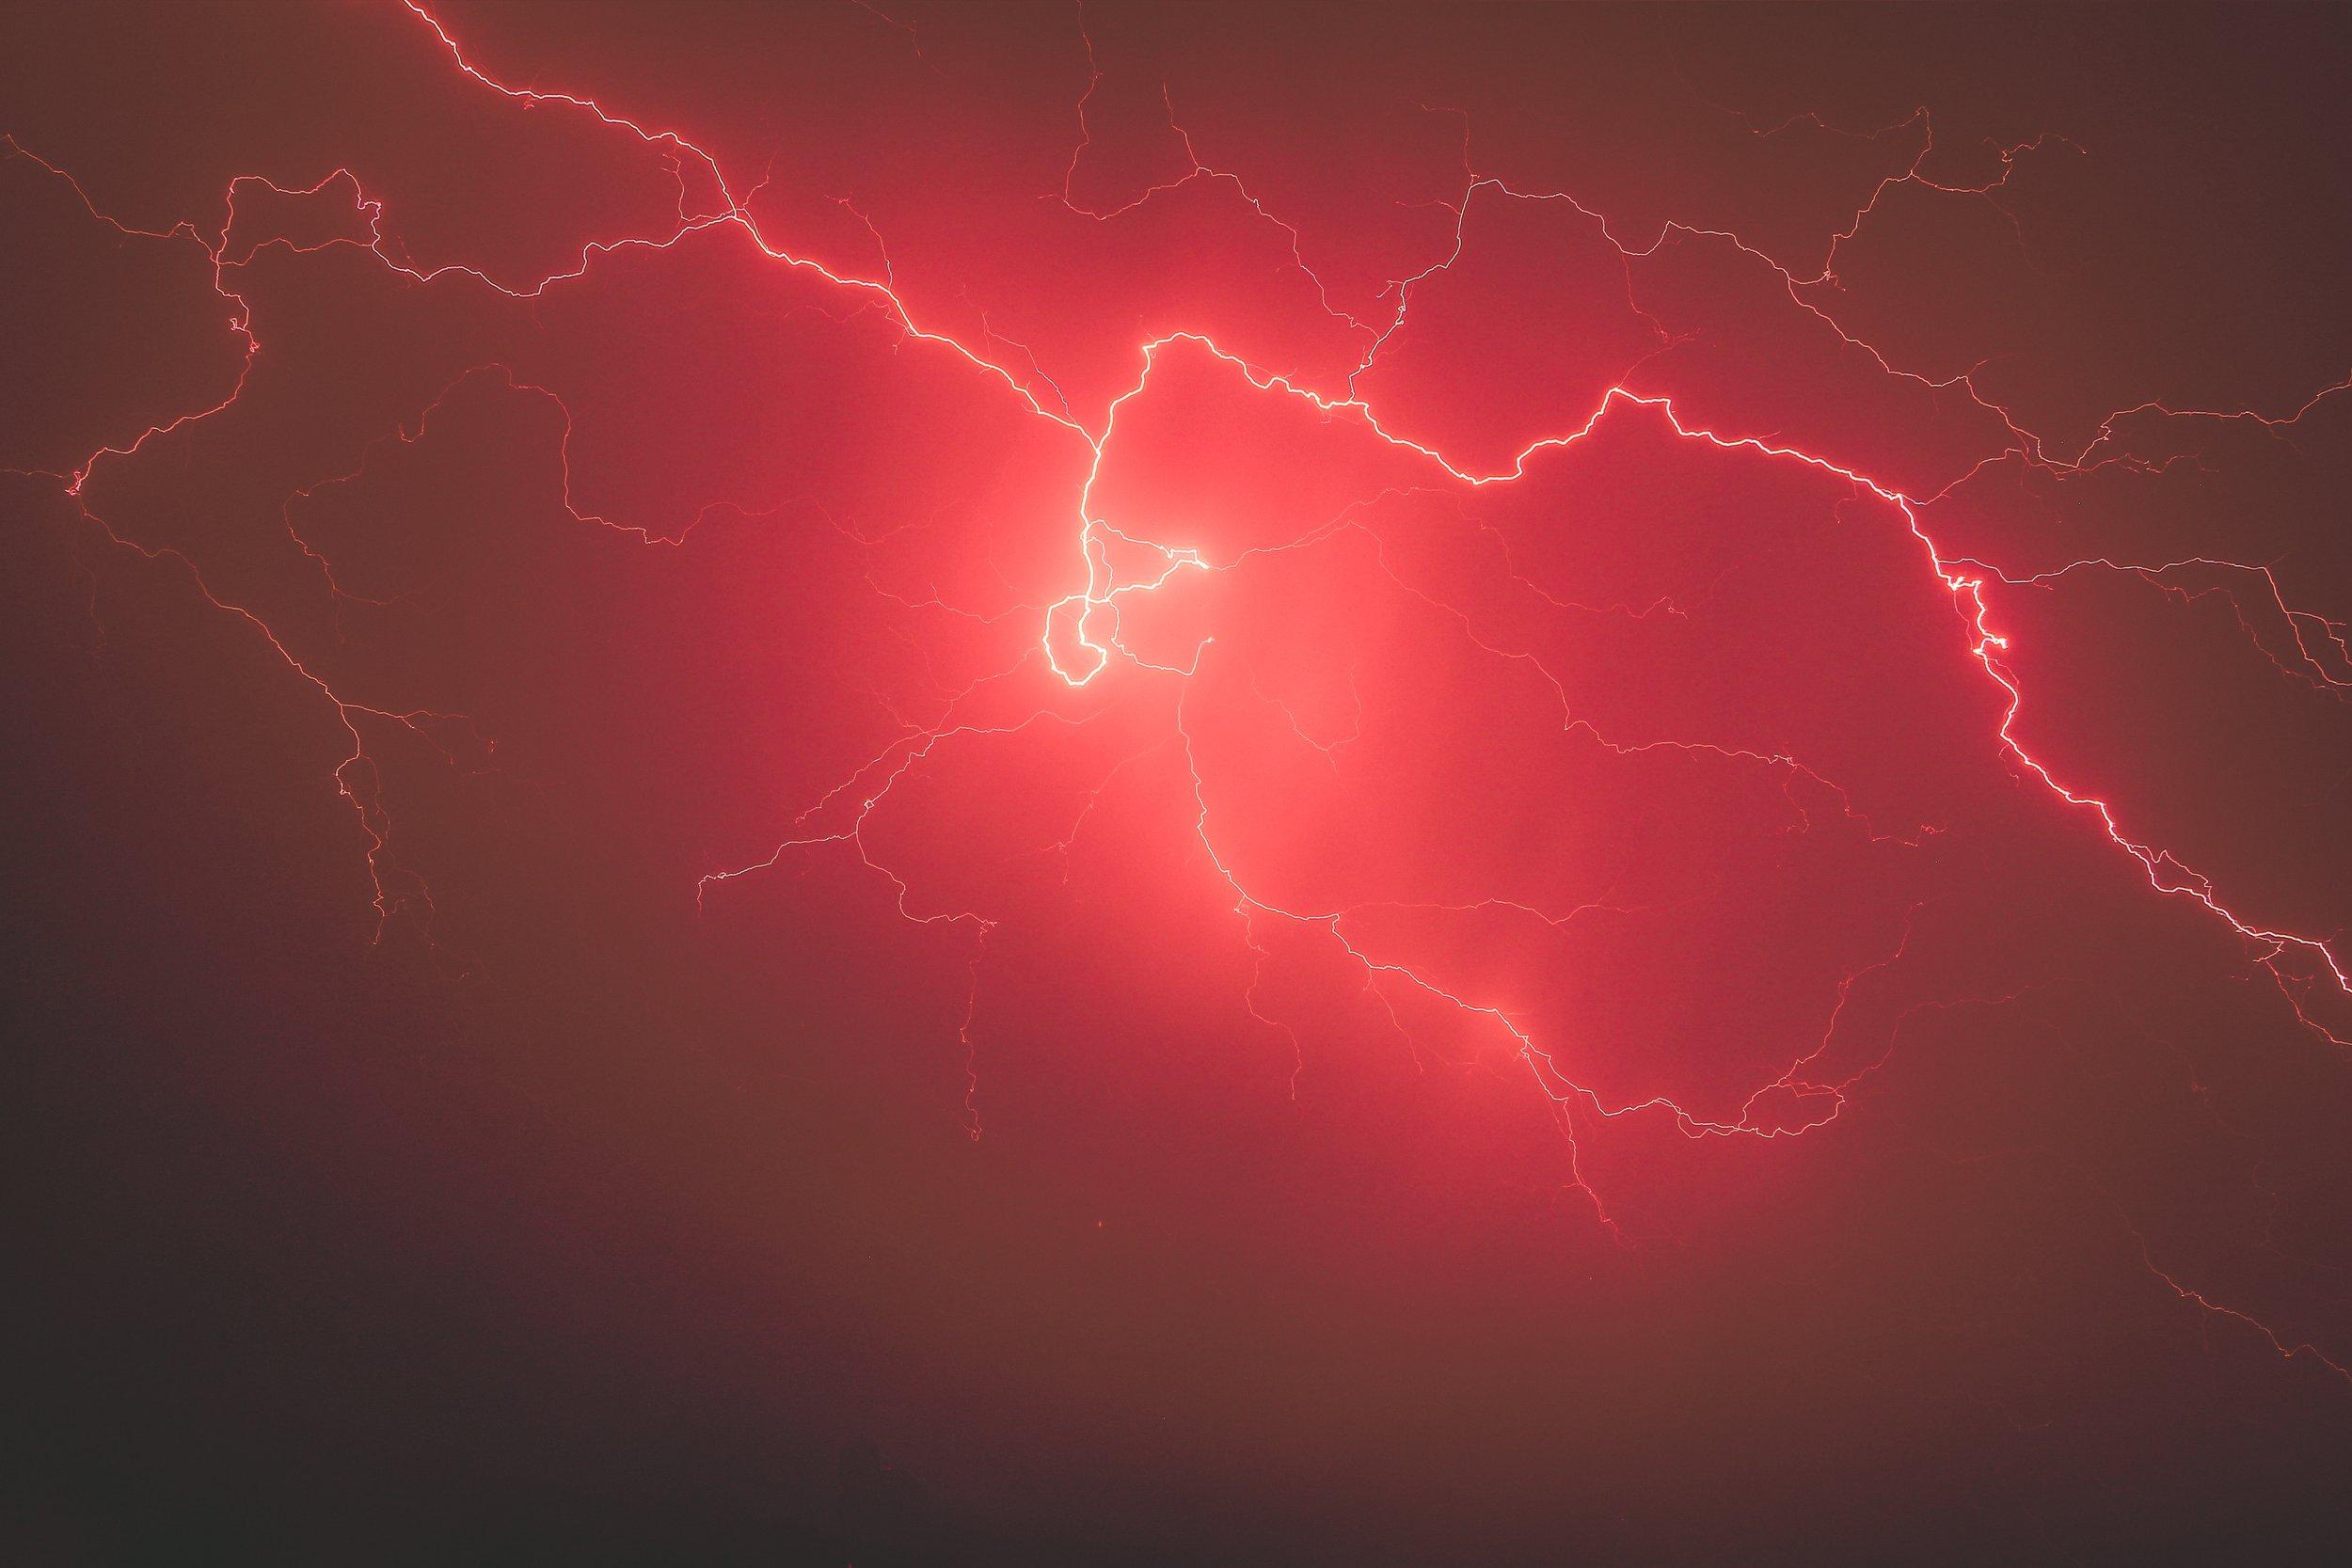 Photo by  Derek Thomson on  Unsplash    [Image Description: Cracks of lightning spread across the sky in a red haze.]